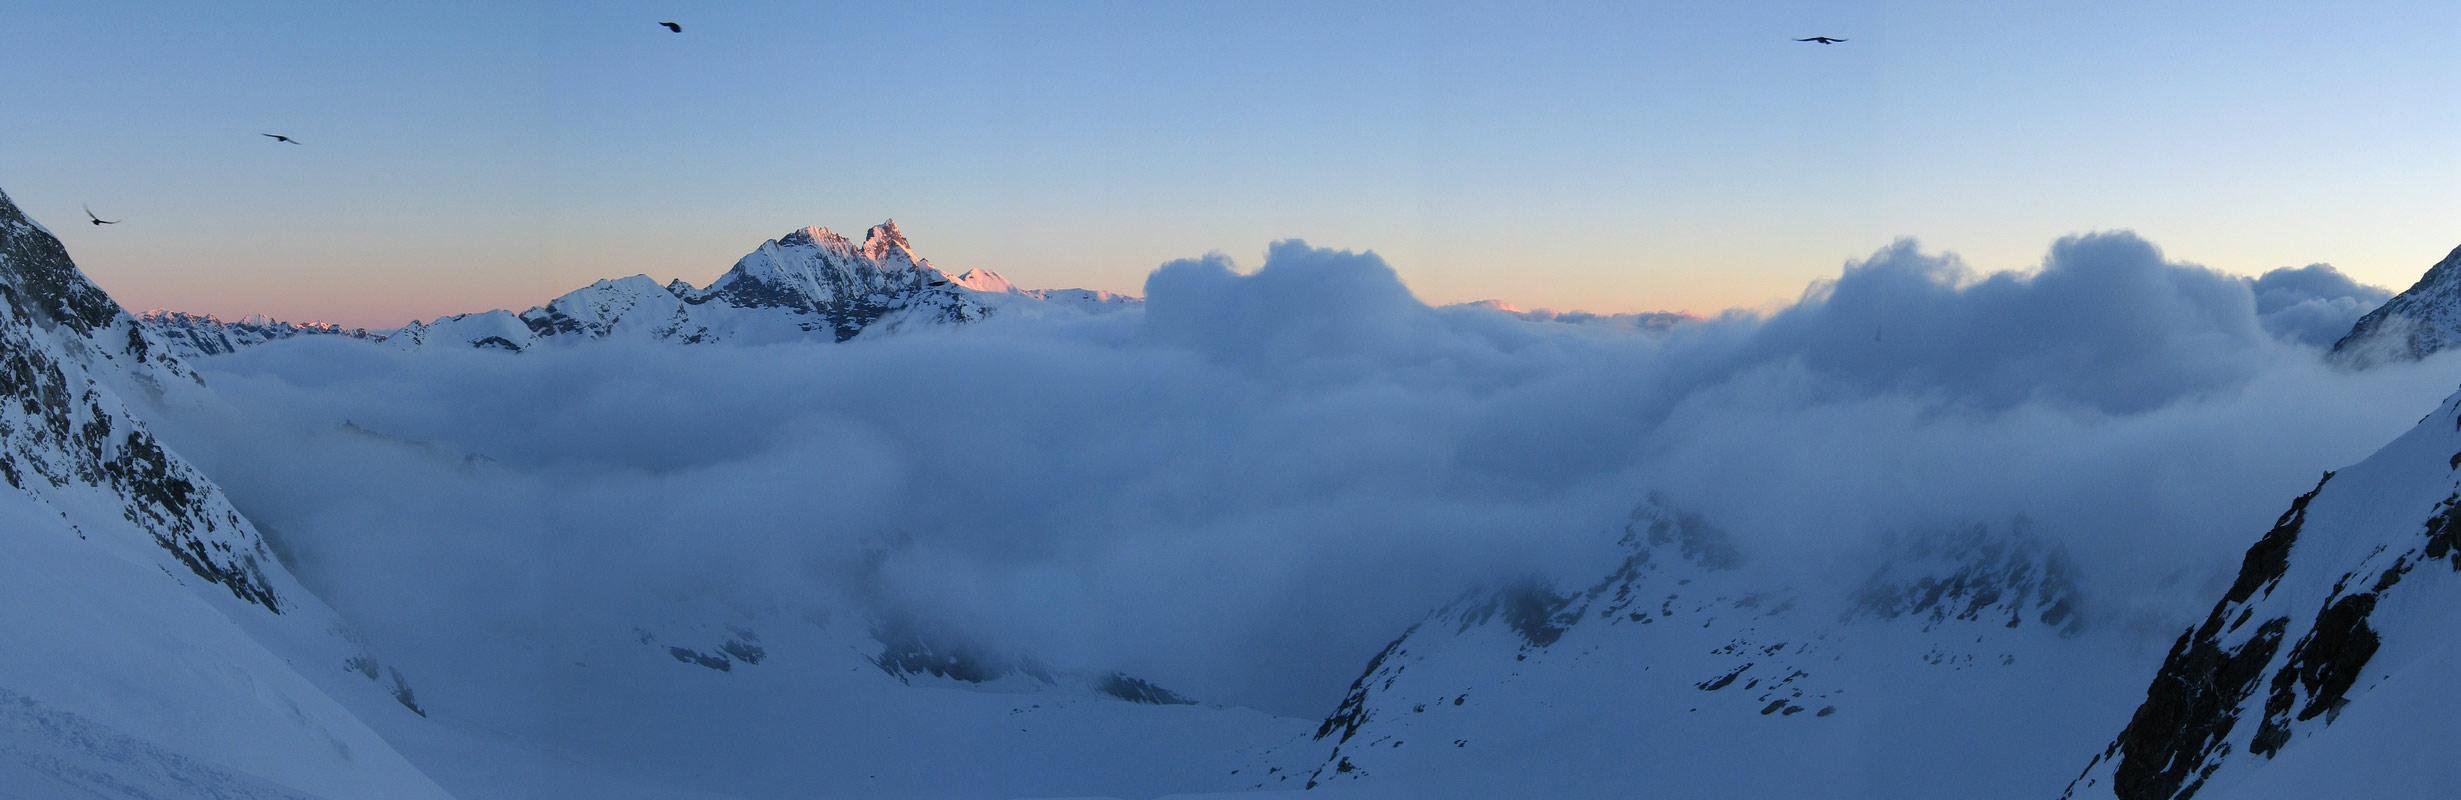 Col Valpelline, Day 6 H.R. Chamonix-Zermatt Walliser Alpen / Alpes valaisannes Švýcarsko panorama 18